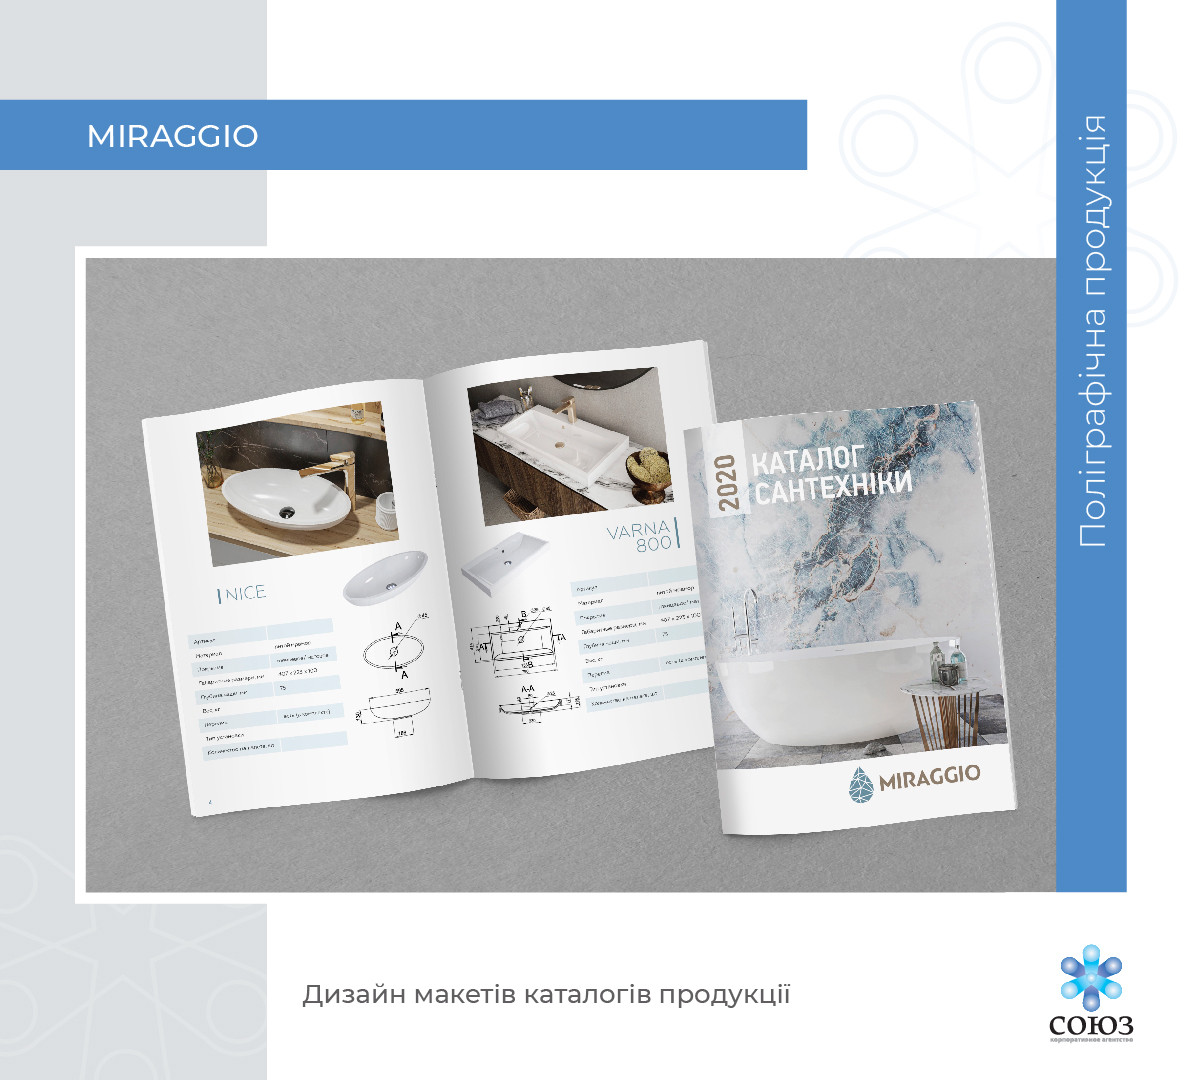 mh_design present 2021-21.jpg